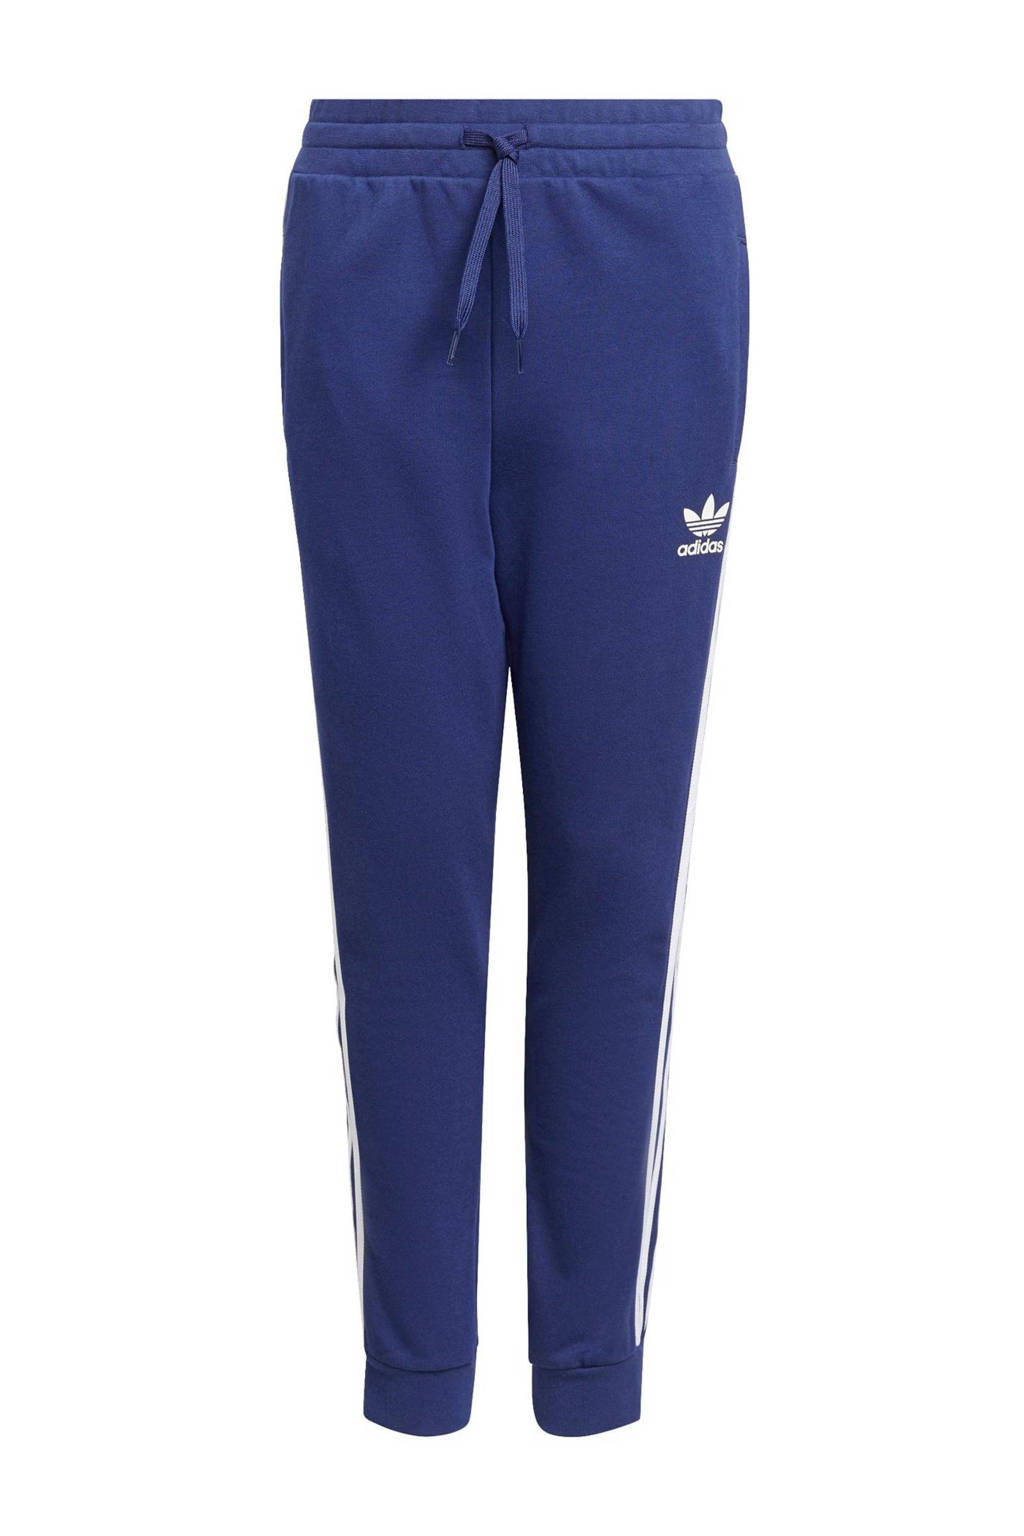 adidas Originals Adicolor joggingbroek donkerblauw/wit, Donkerblauw/wit